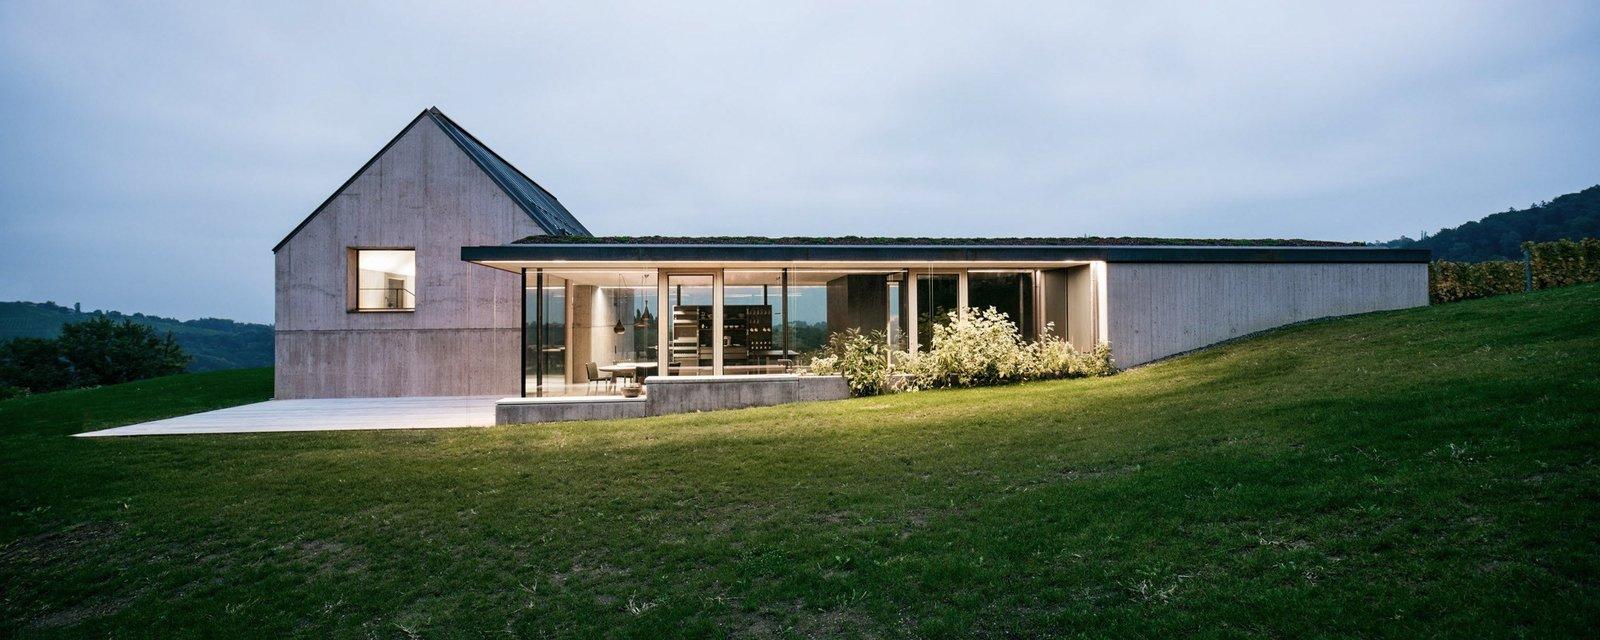 A Former Wine Press House Becomes a Modern Vineyard Home